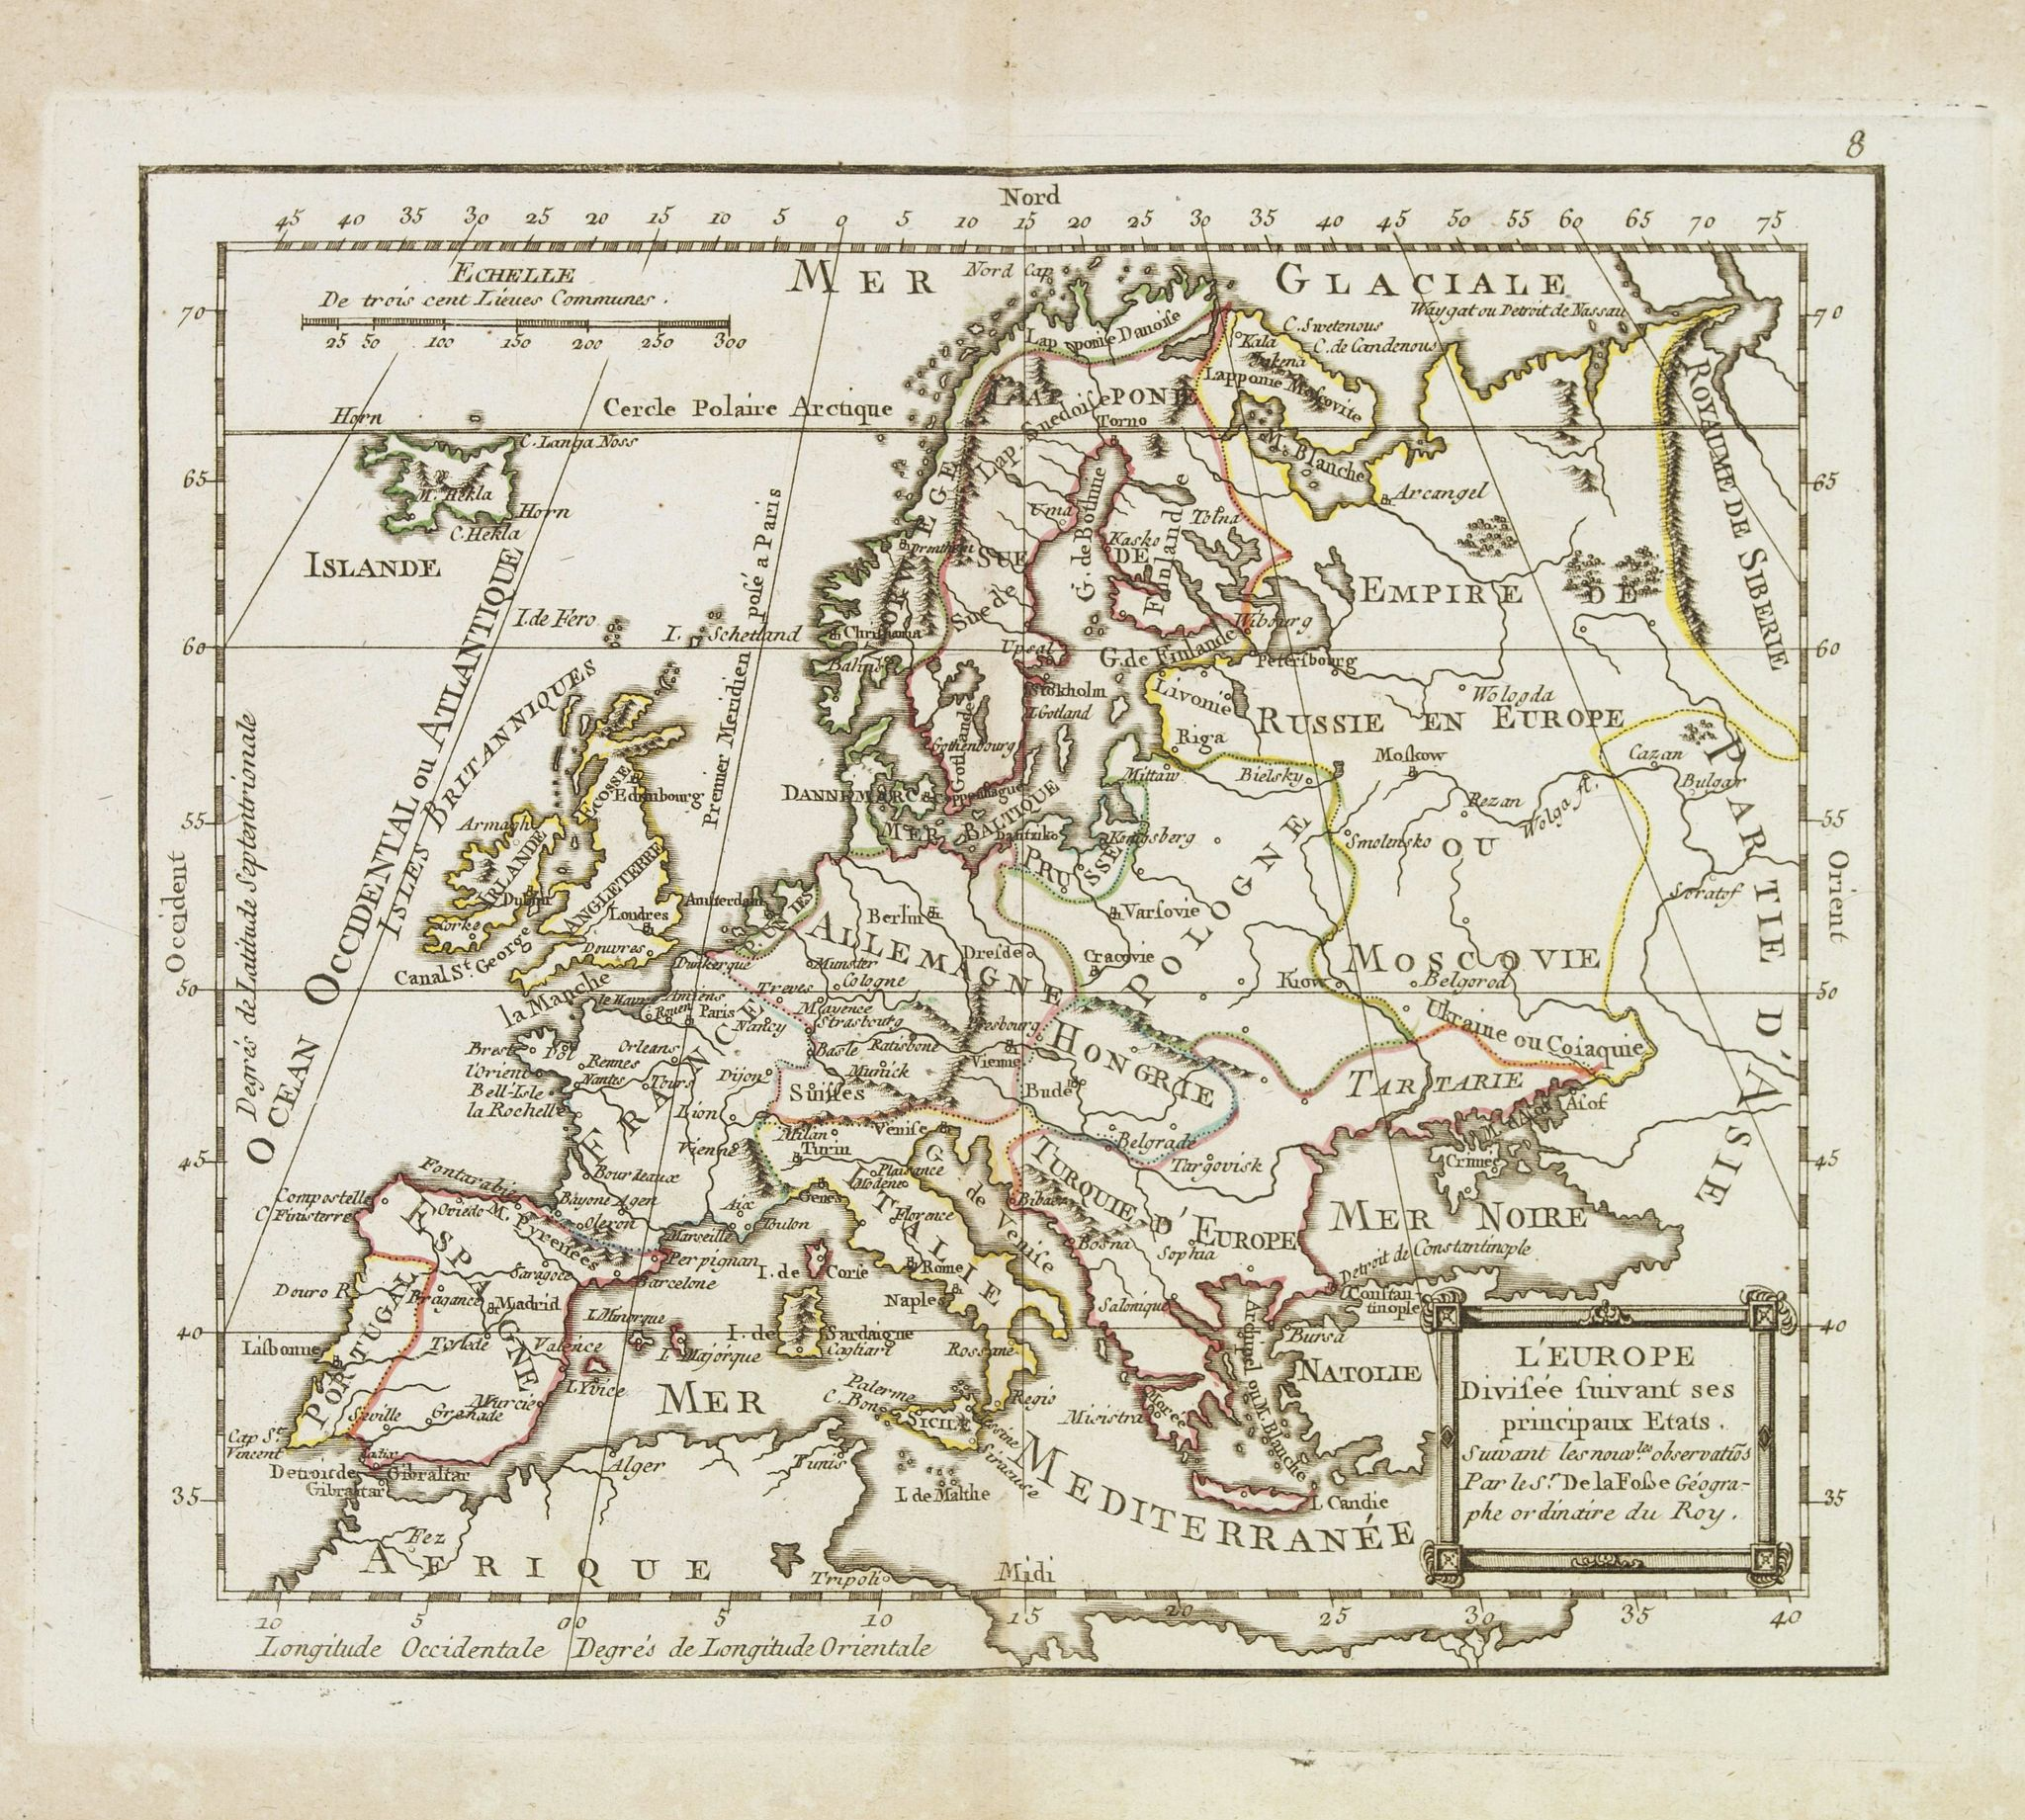 MONDHARE, L.J. / NOLIN, J.B. -  L'Europe Divisée Suivant ses principaux Etats . . .